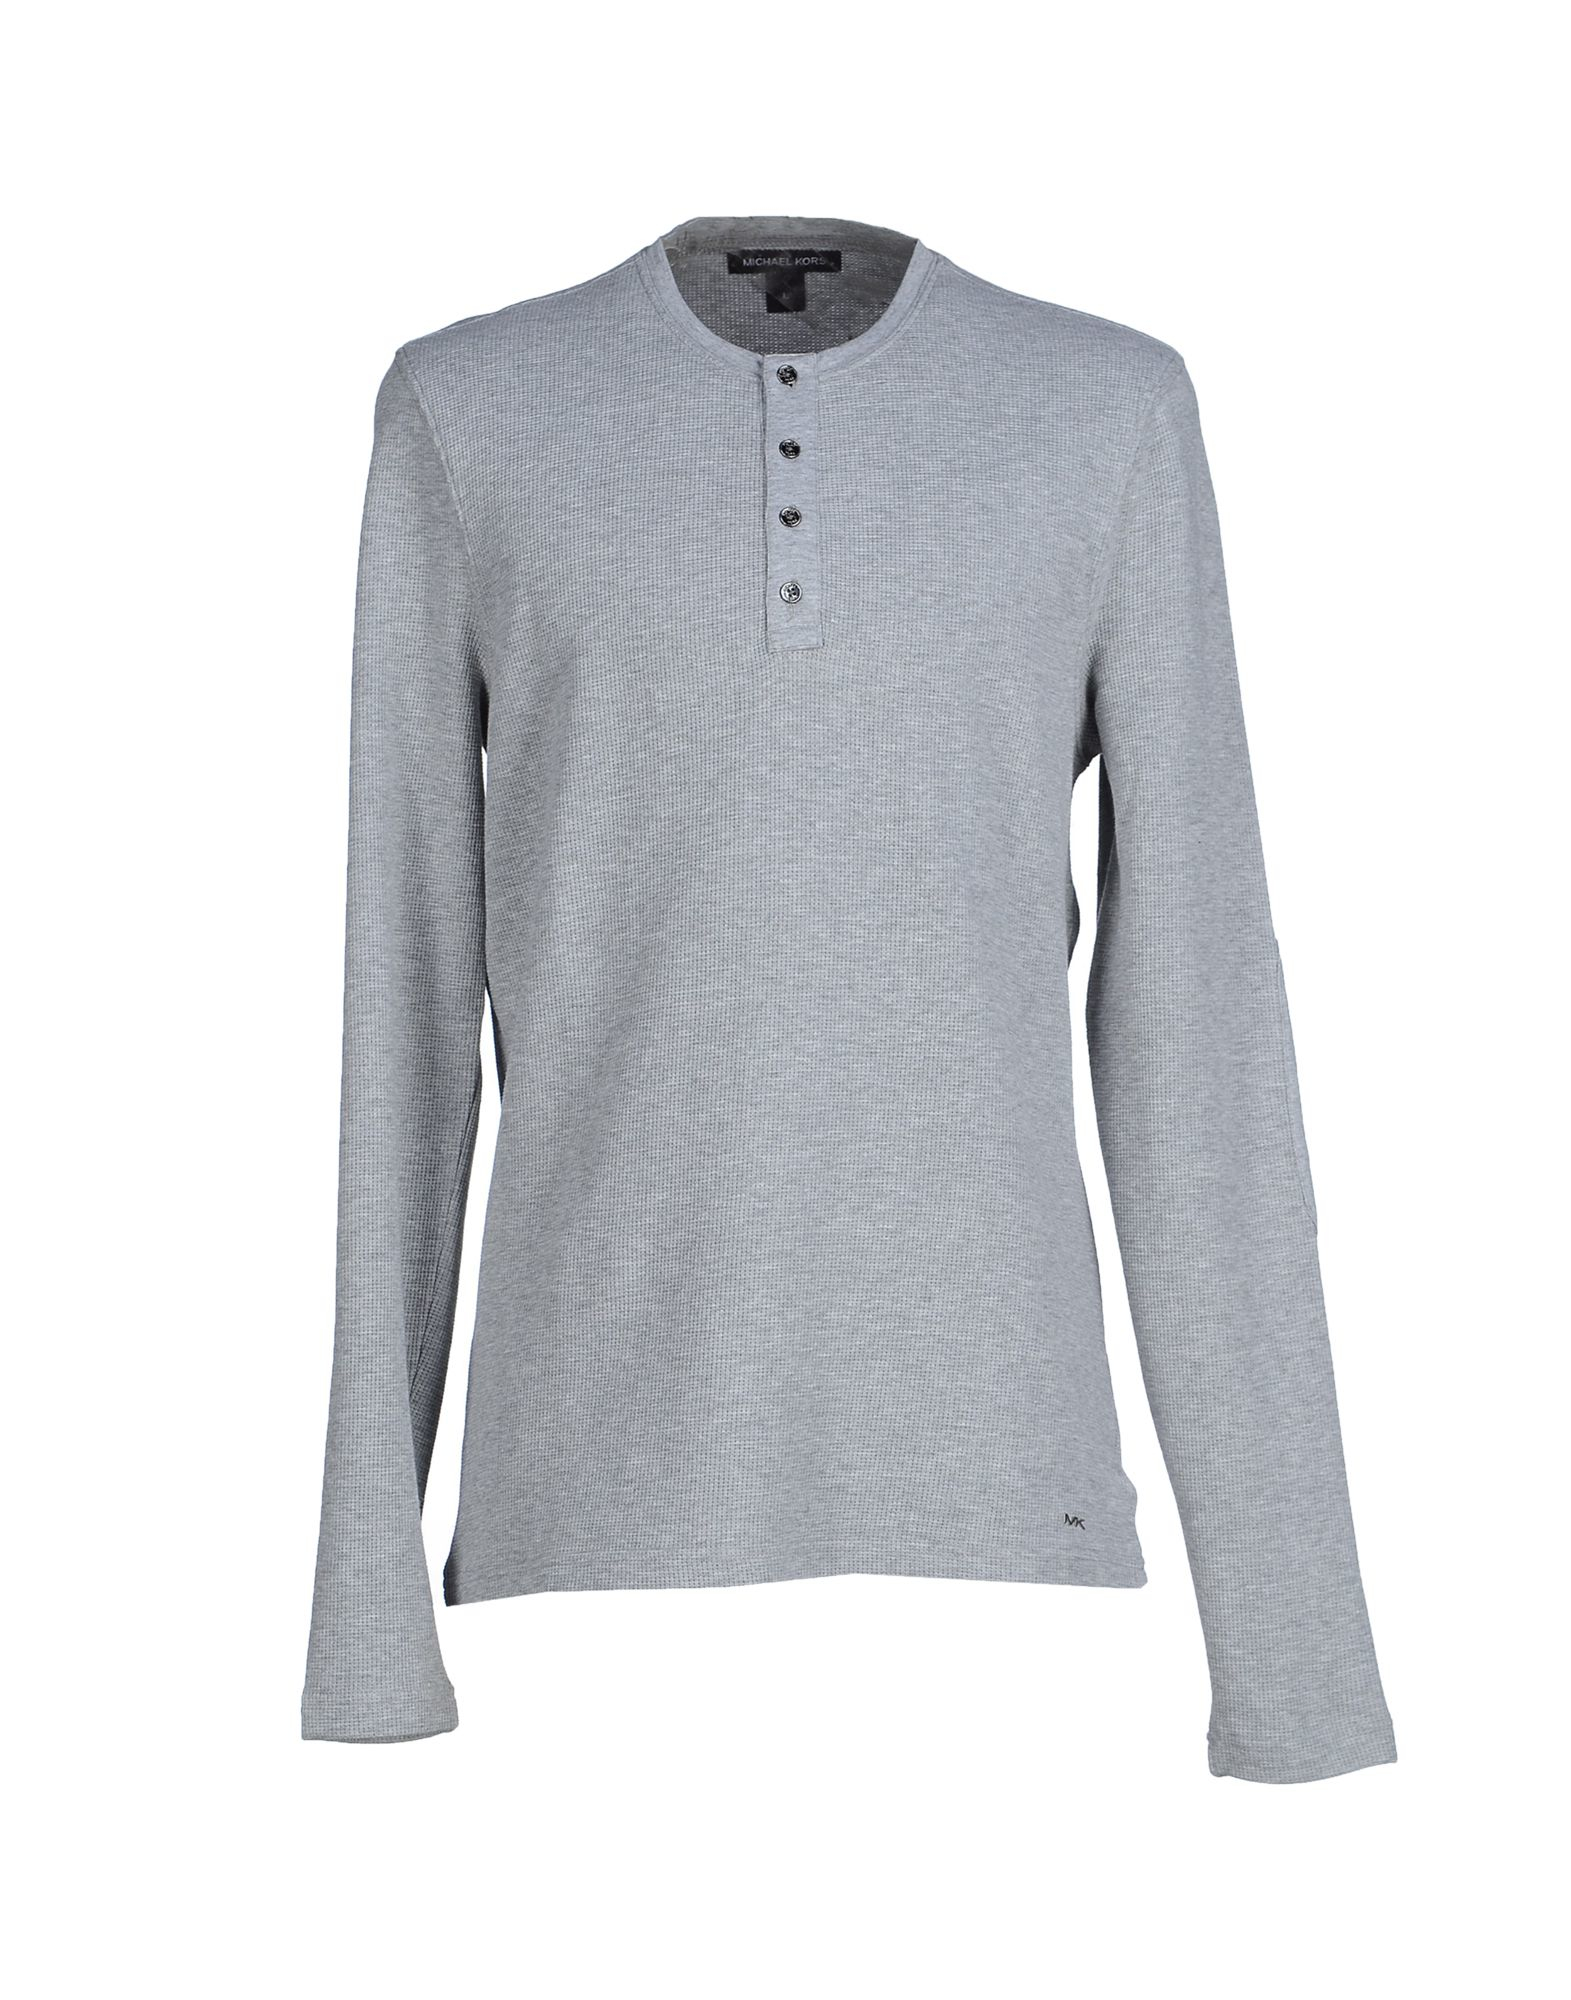 michael kors t shirt in gray for men lyst. Black Bedroom Furniture Sets. Home Design Ideas